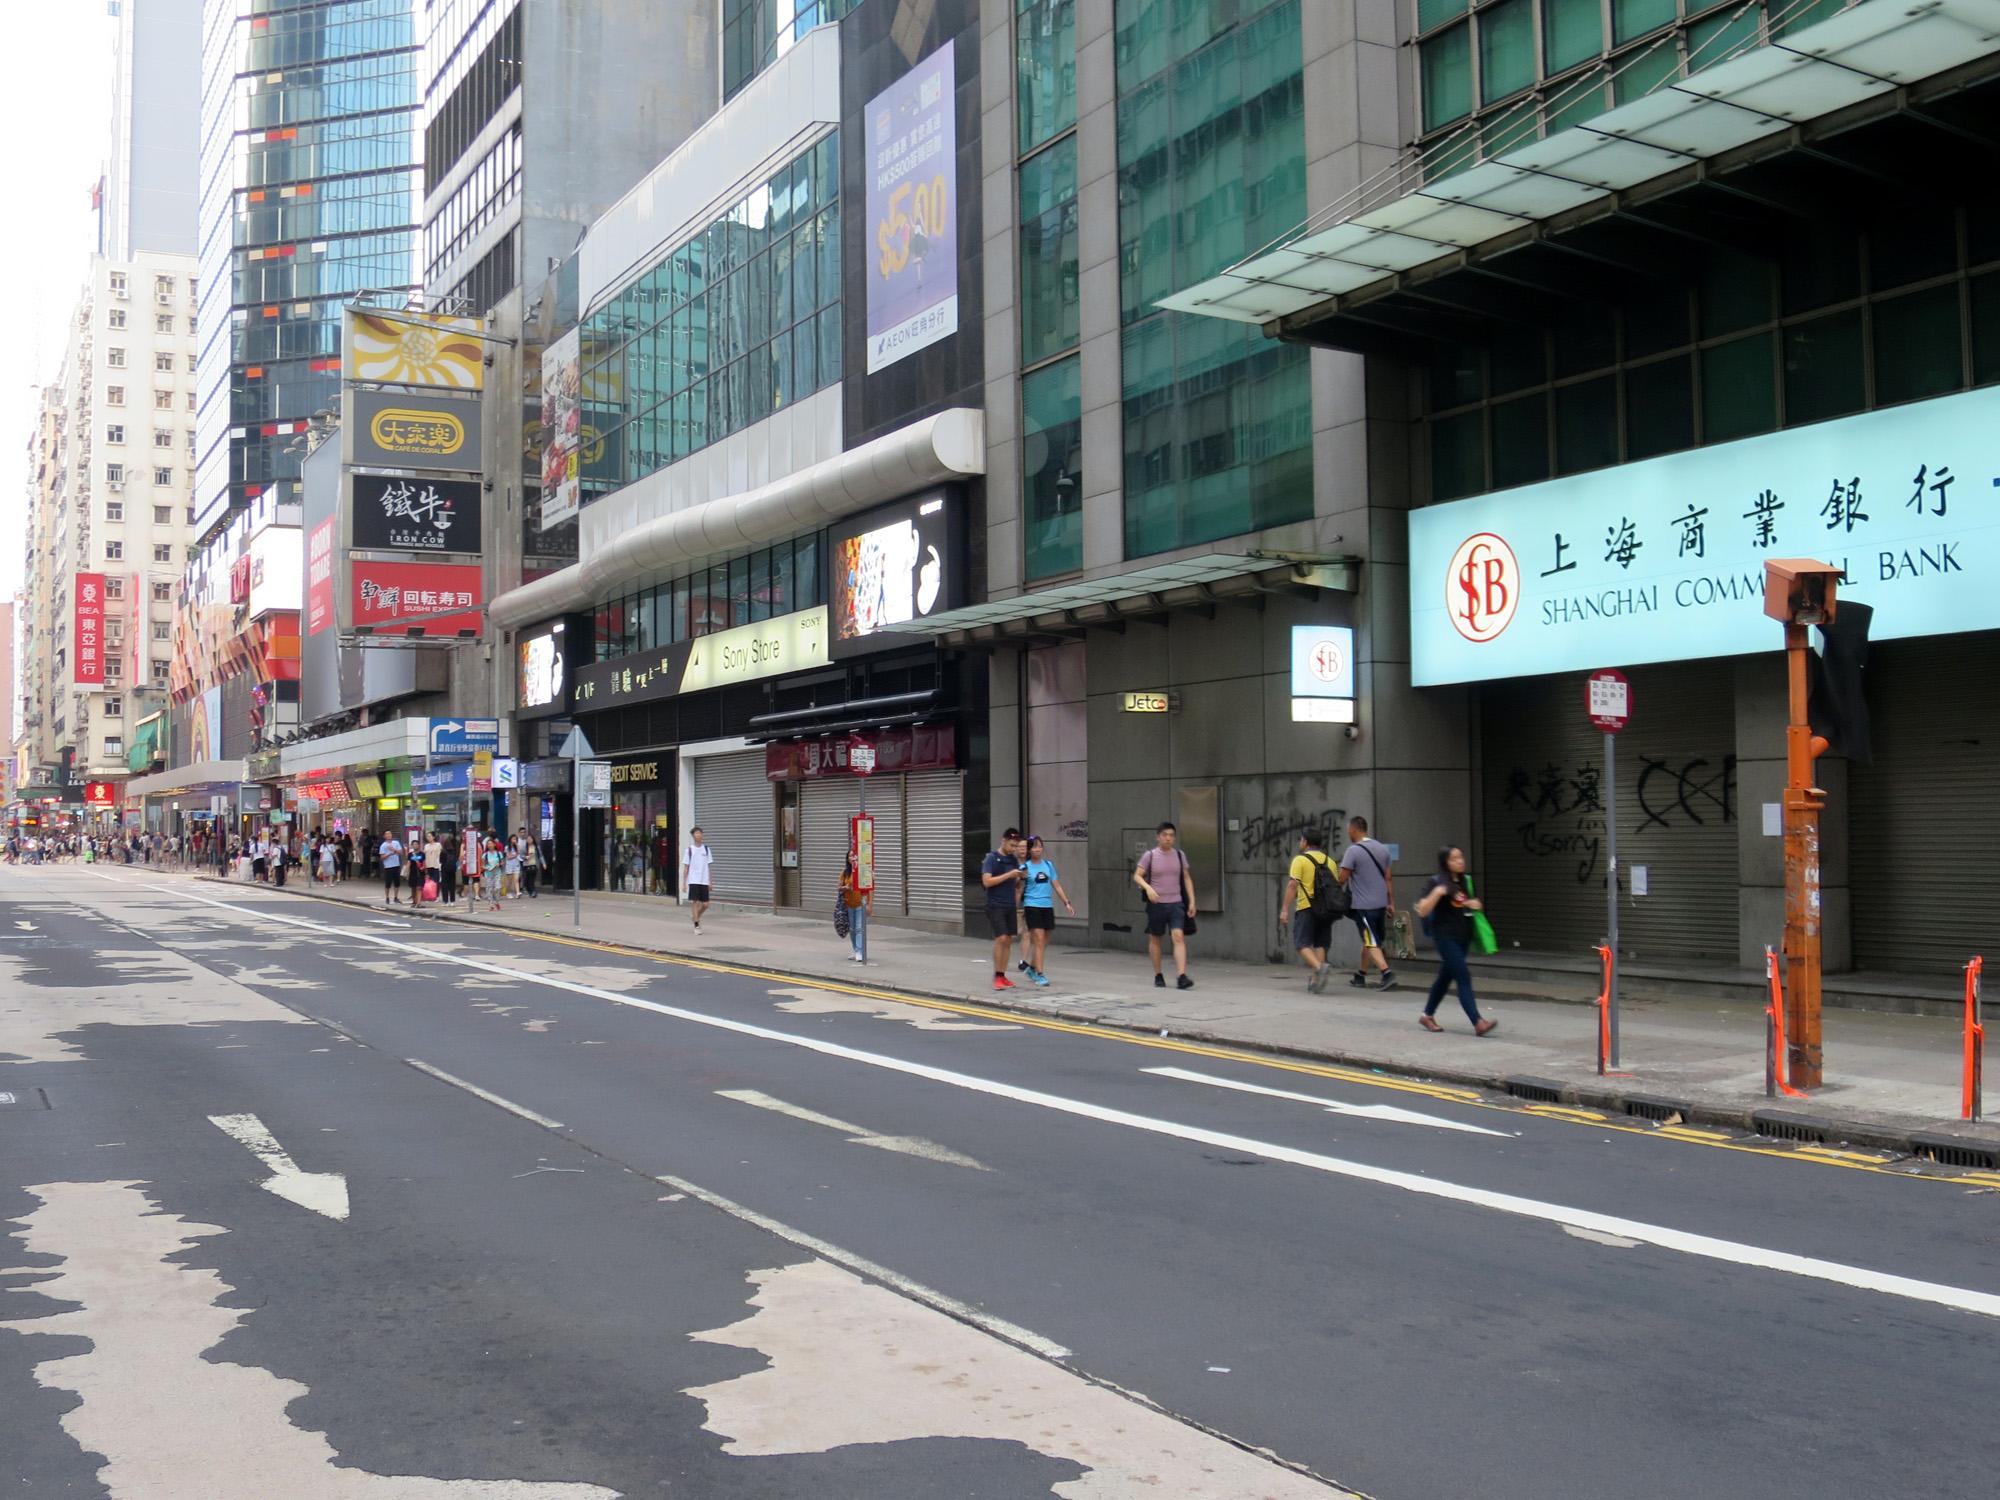 旺角站 (彌敦道)